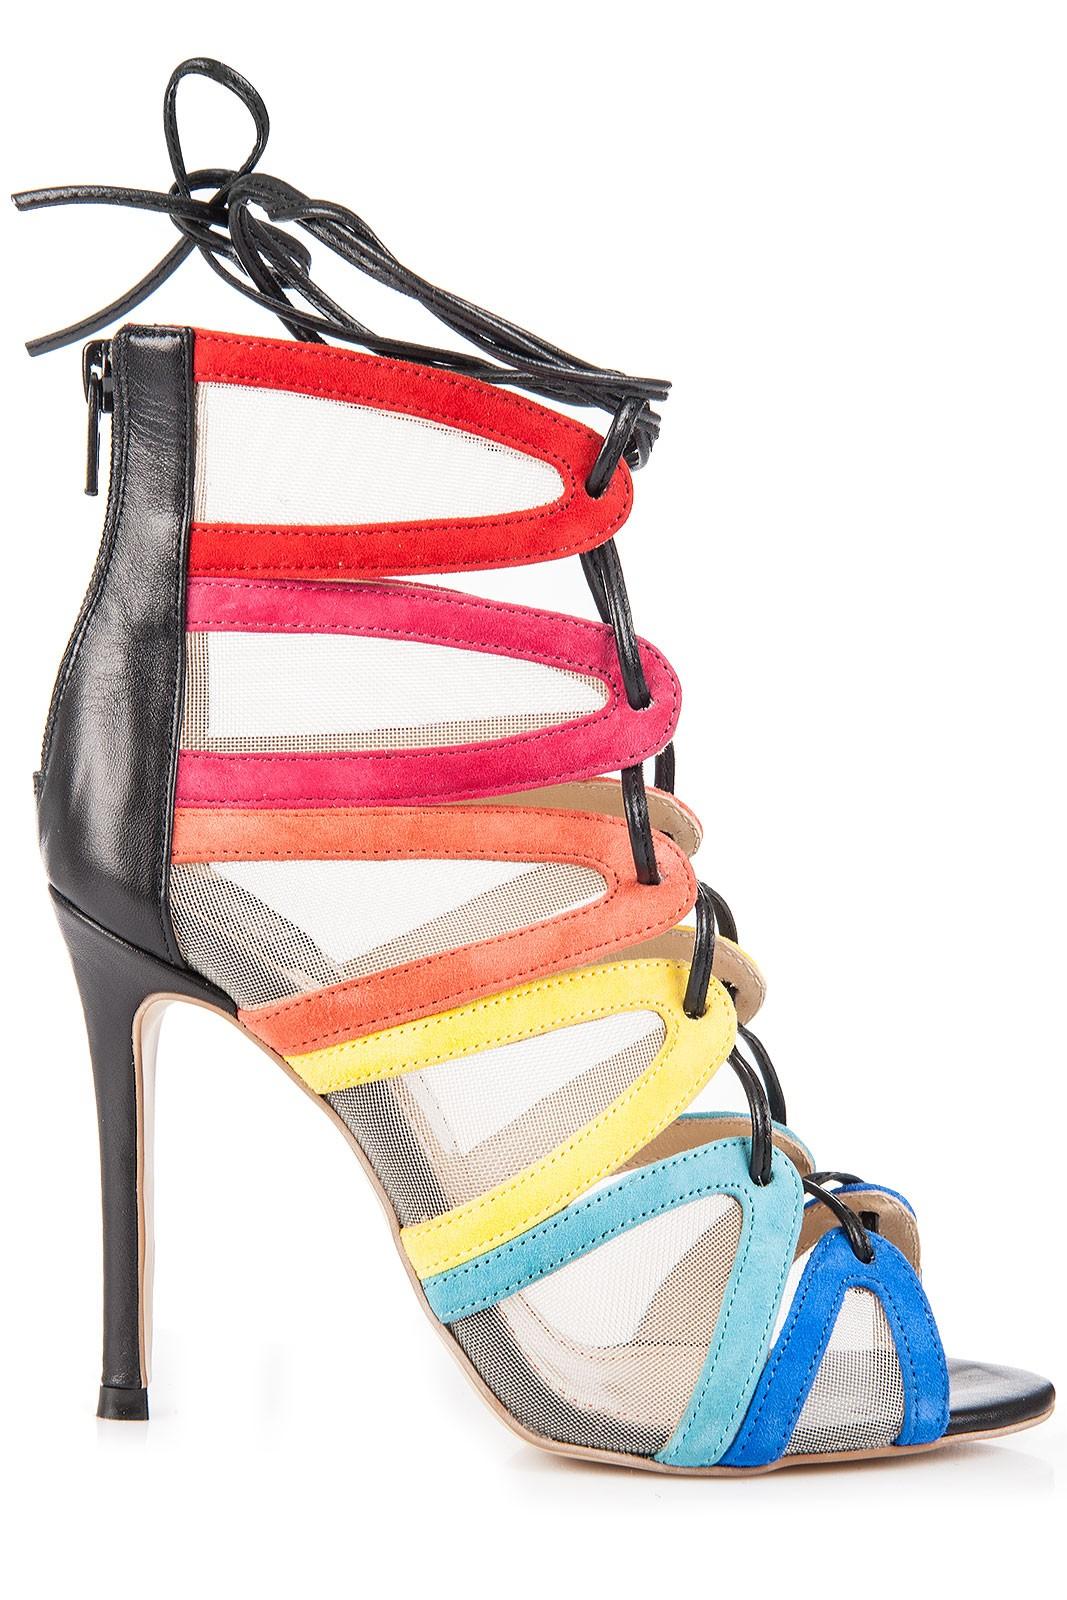 Atelier Faiblesse   Sandale cu platforma si toc piele